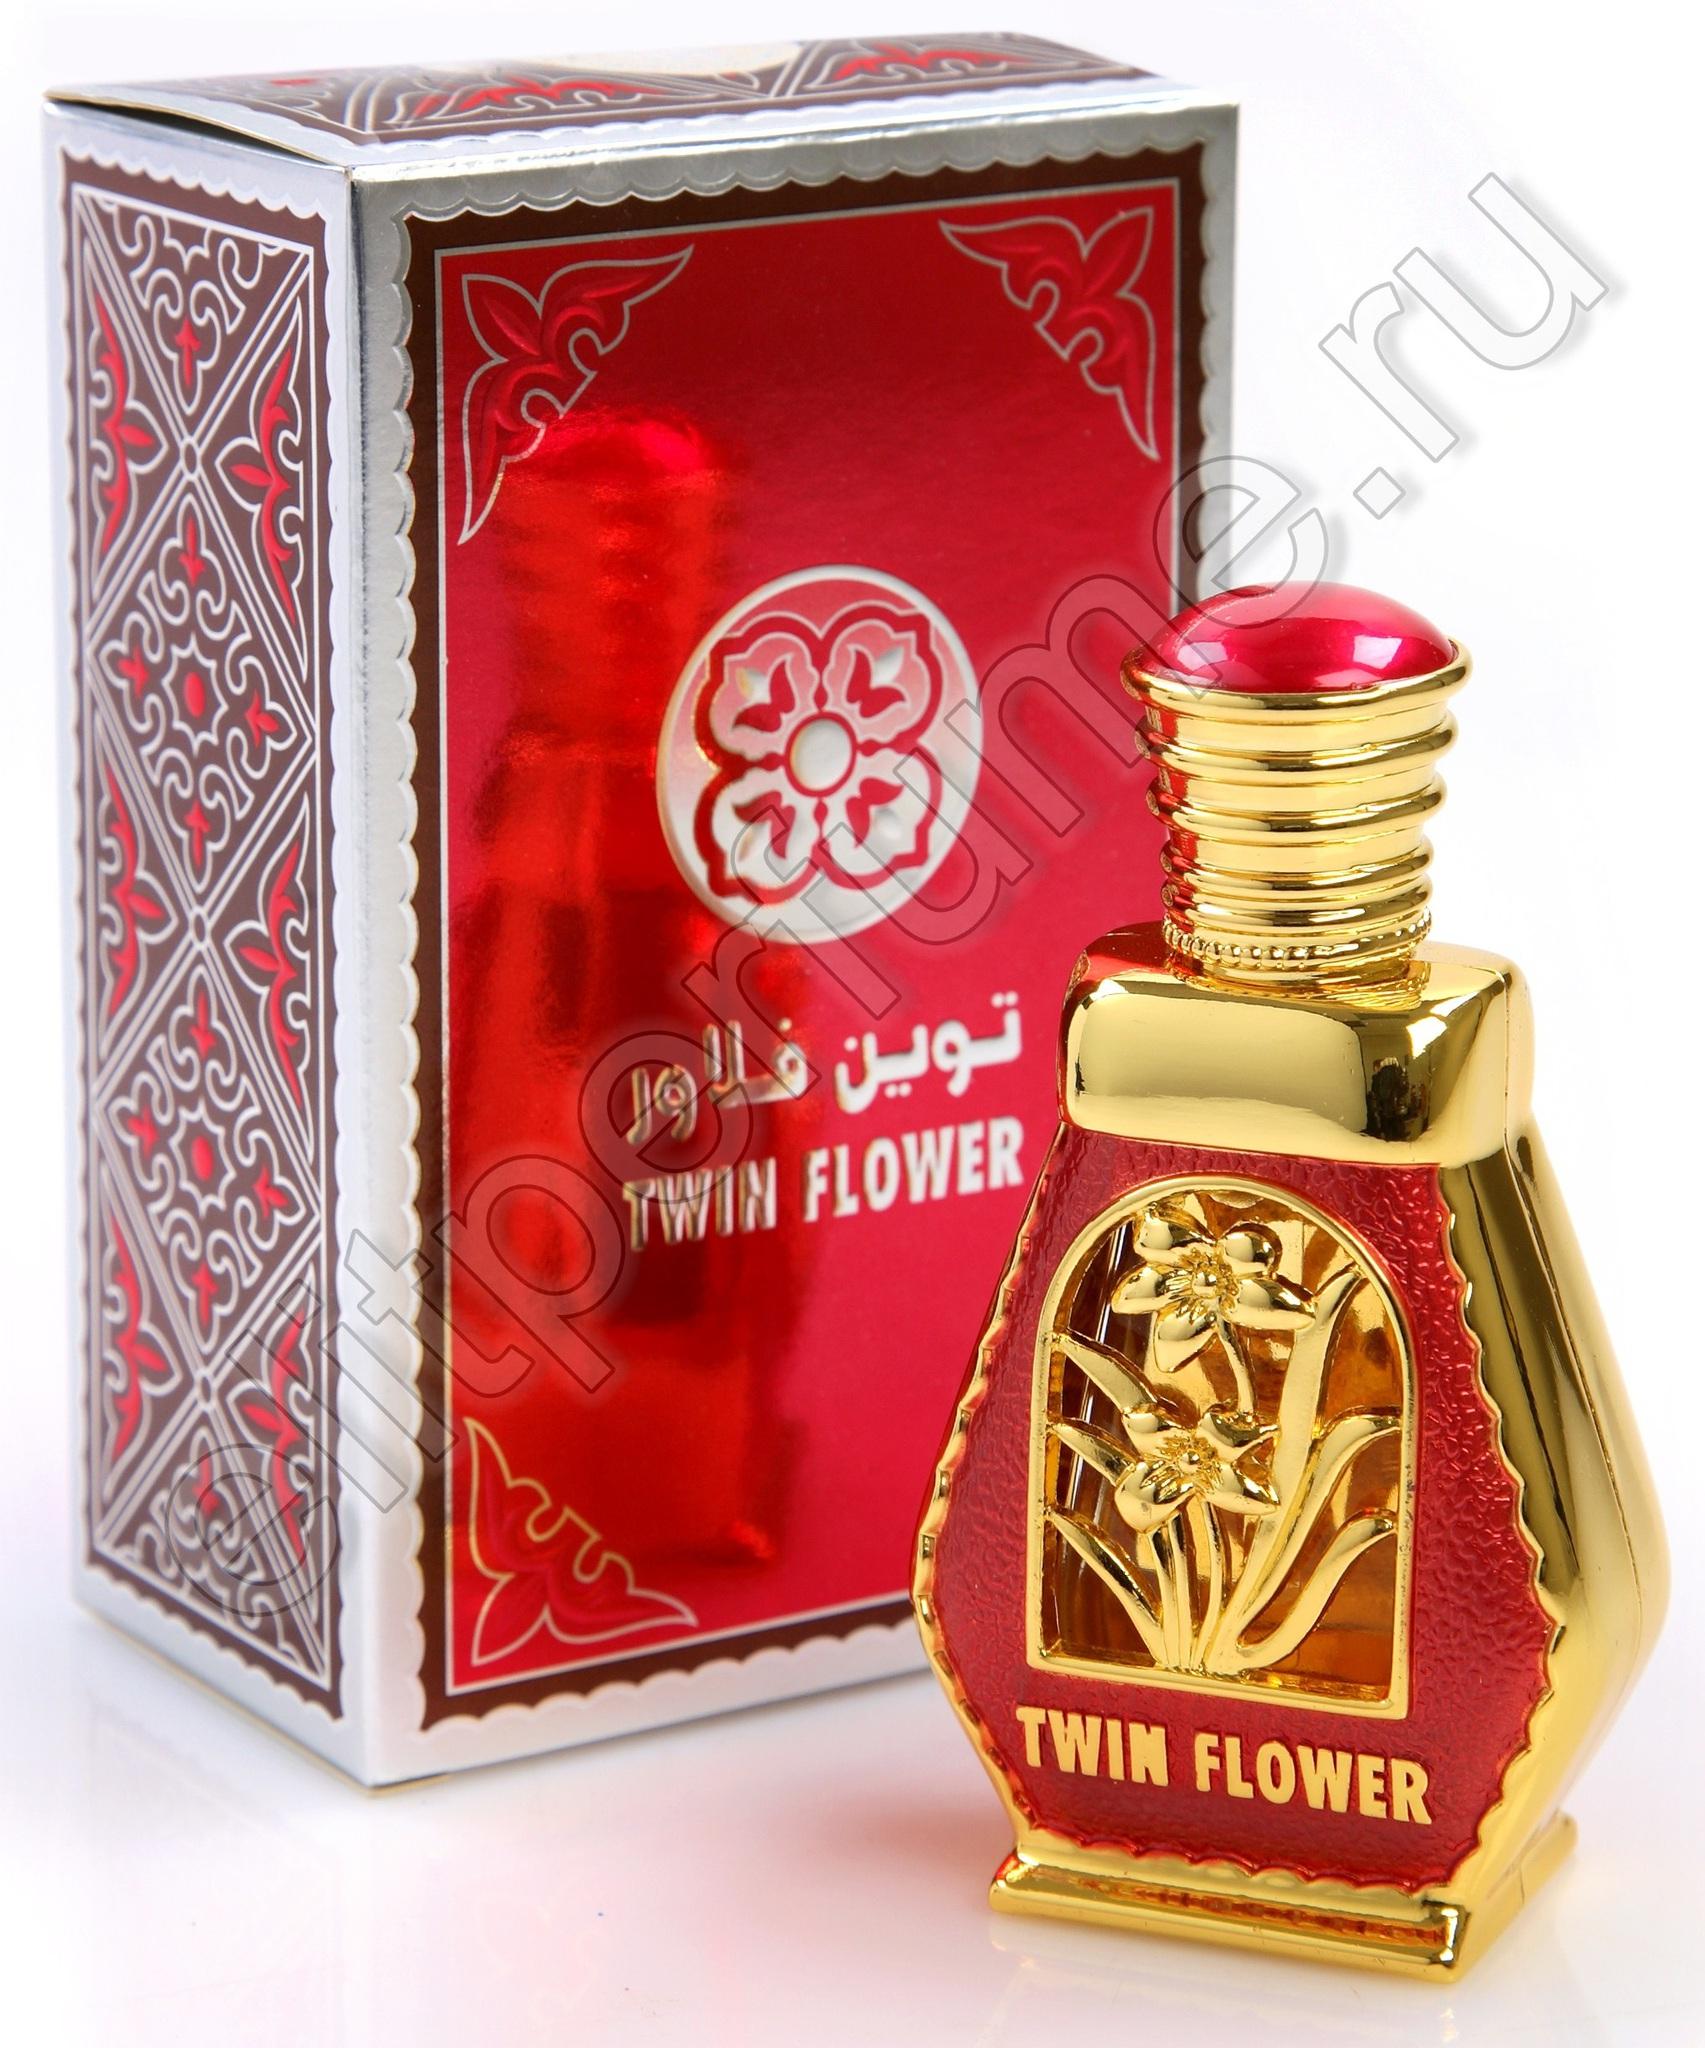 Пробники для духов Цветок-близнец Twin Flower 1 мл арабские масляные духи от Аль Харамайн Al Haramin Perfumes